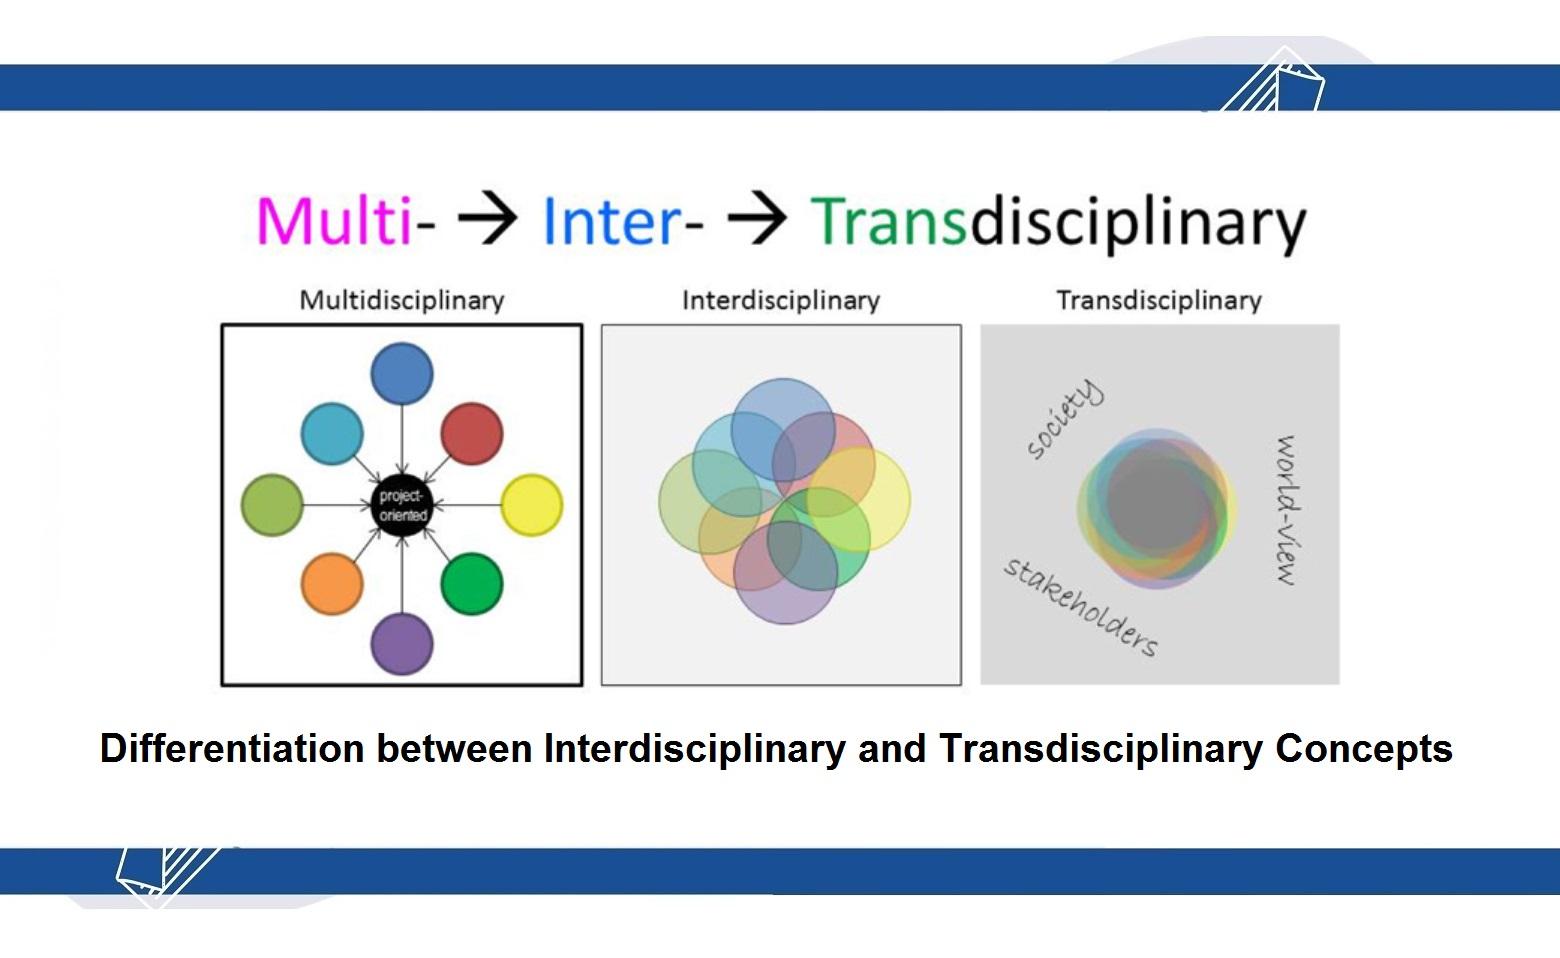 Transdisciplinary Concepts